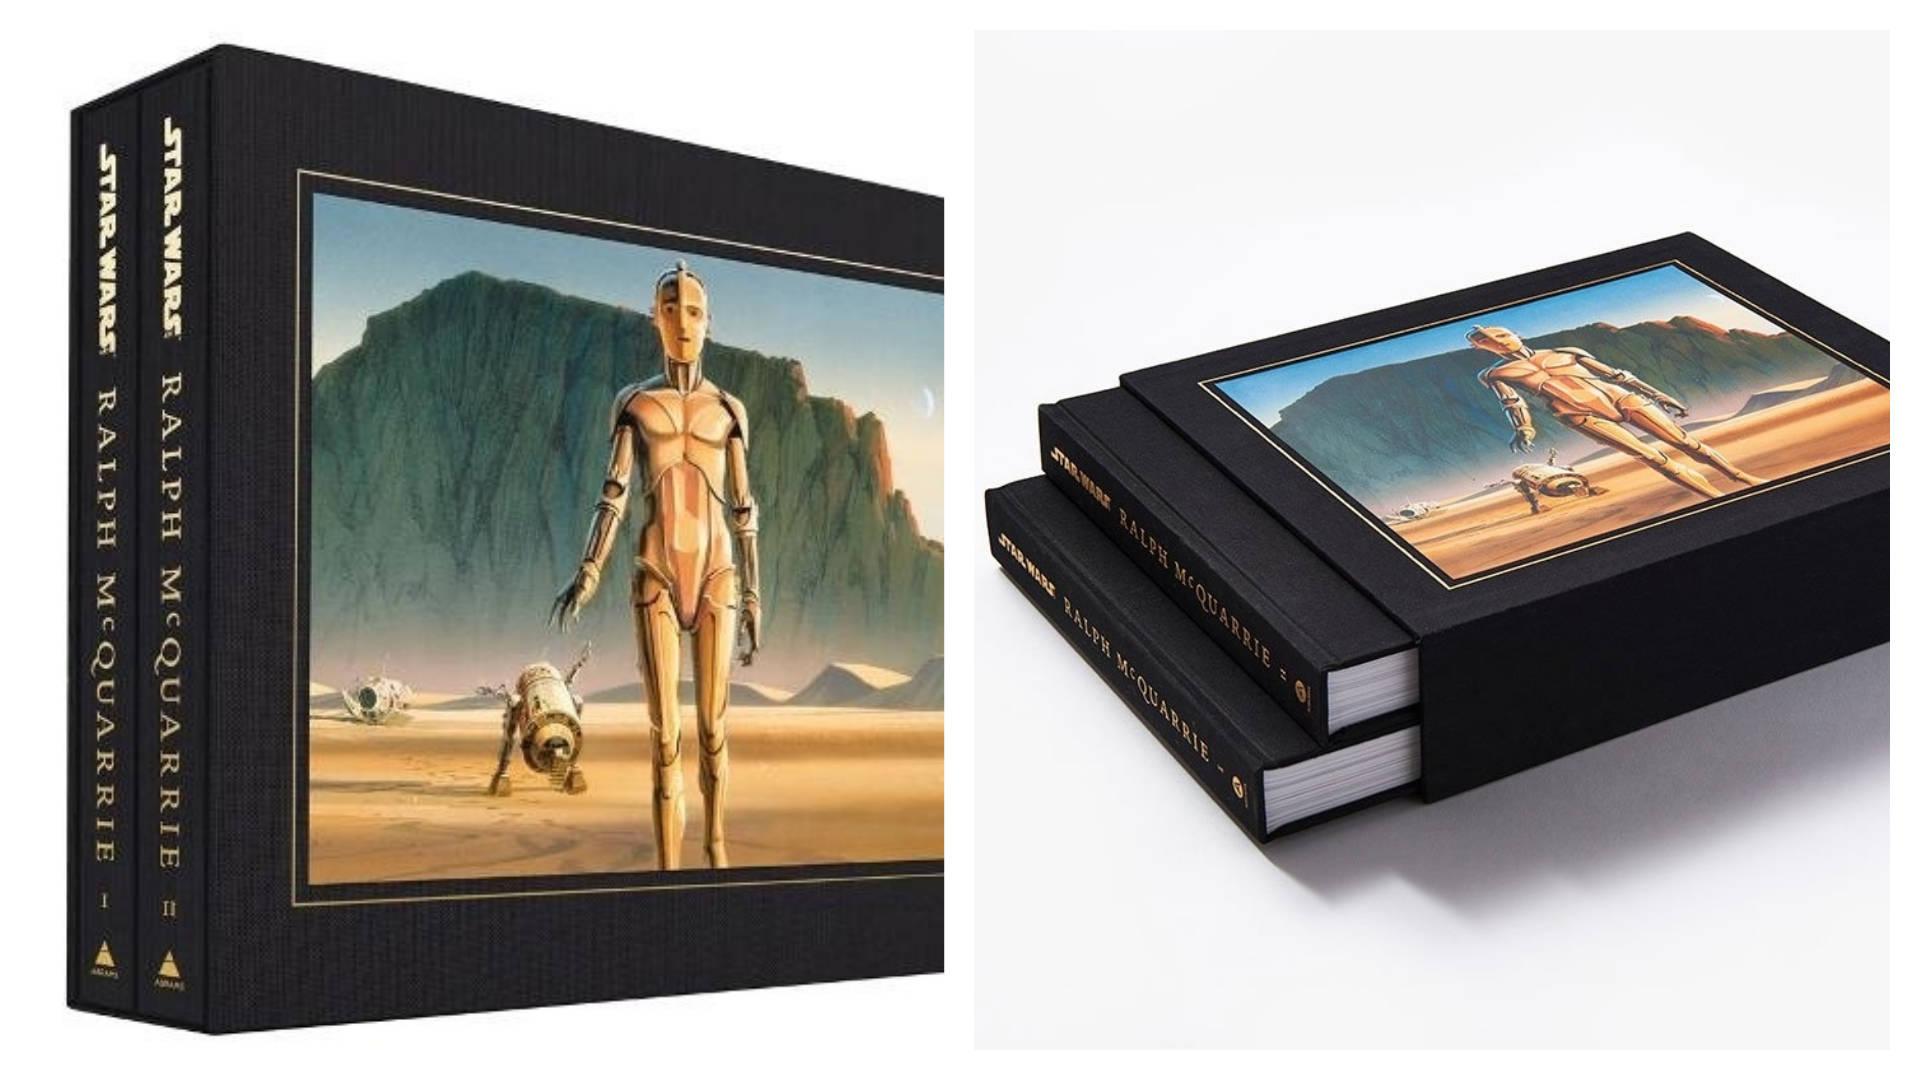 10+1 Artbook e Libri Illustrati per veri Nerd